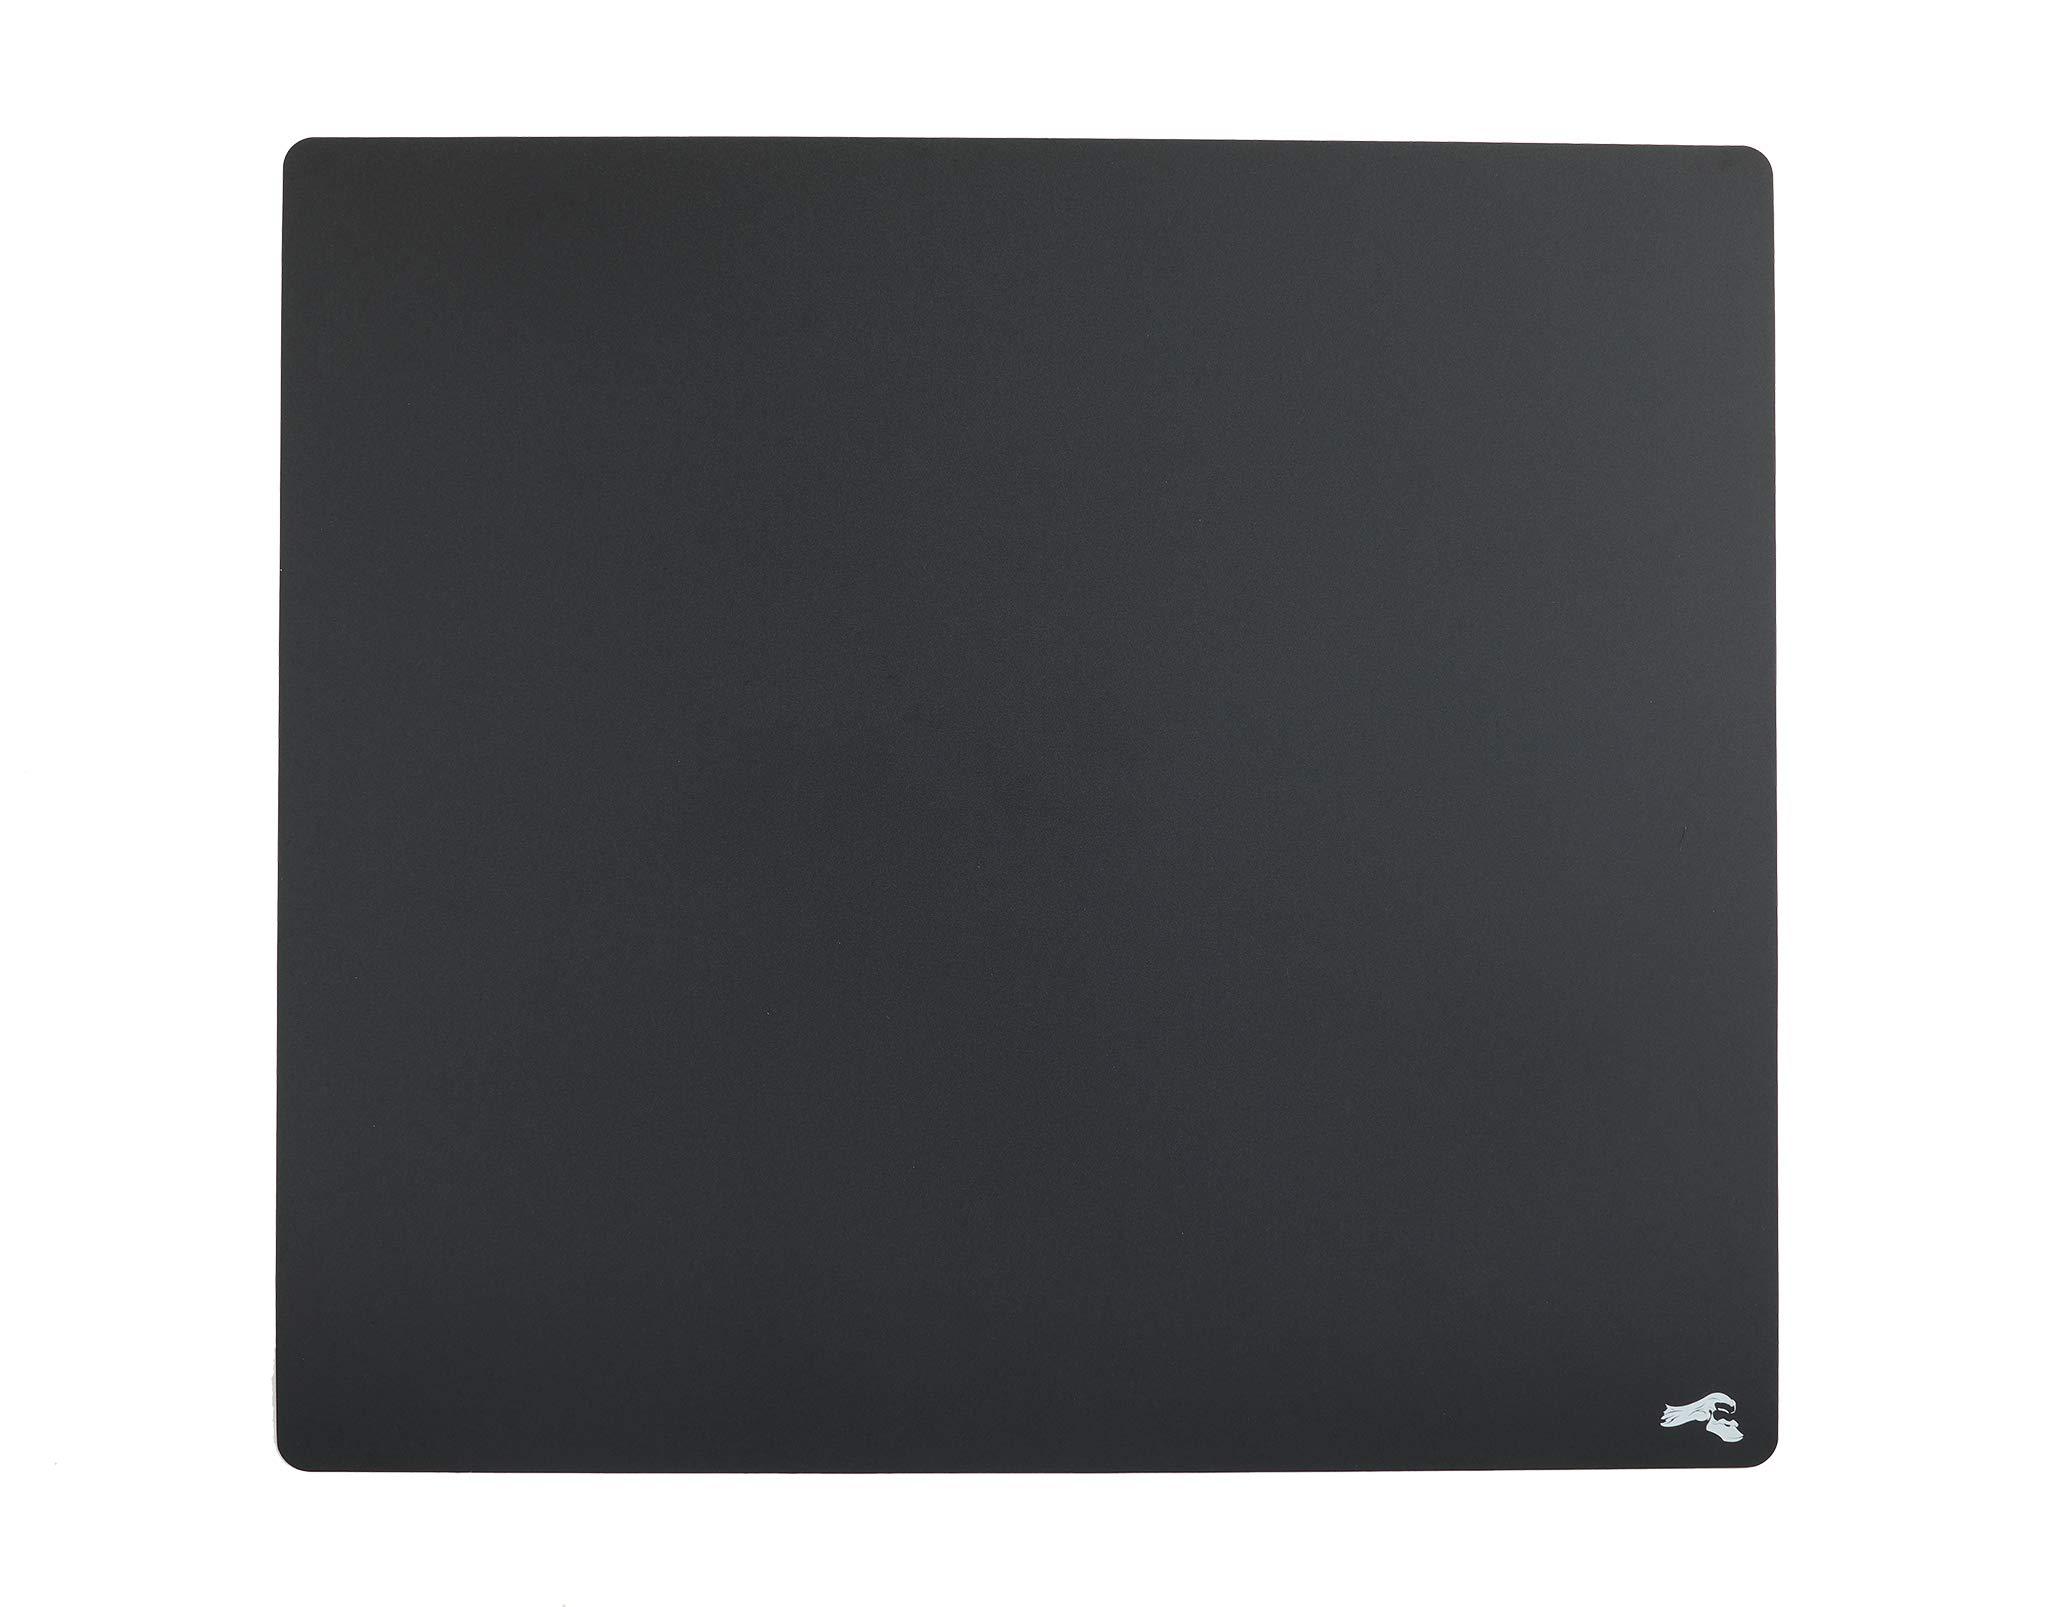 Glorious Helios - XL Ultra Thin Polycarbonate Hard Mousepad | 16x18'' (GH-XL)